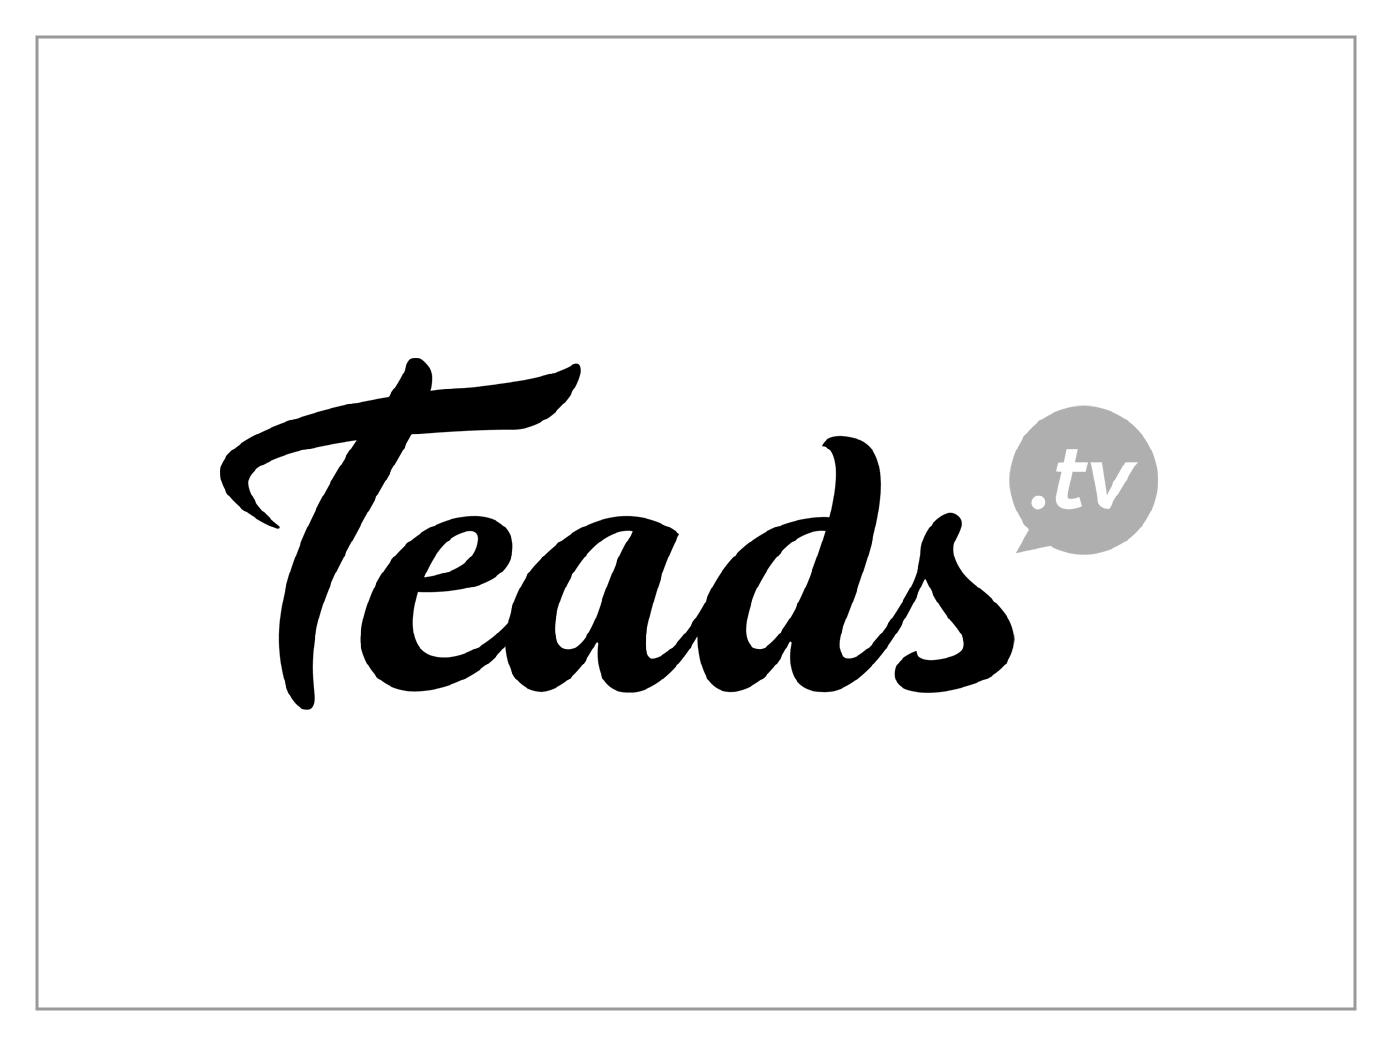 Teads_Logo.png